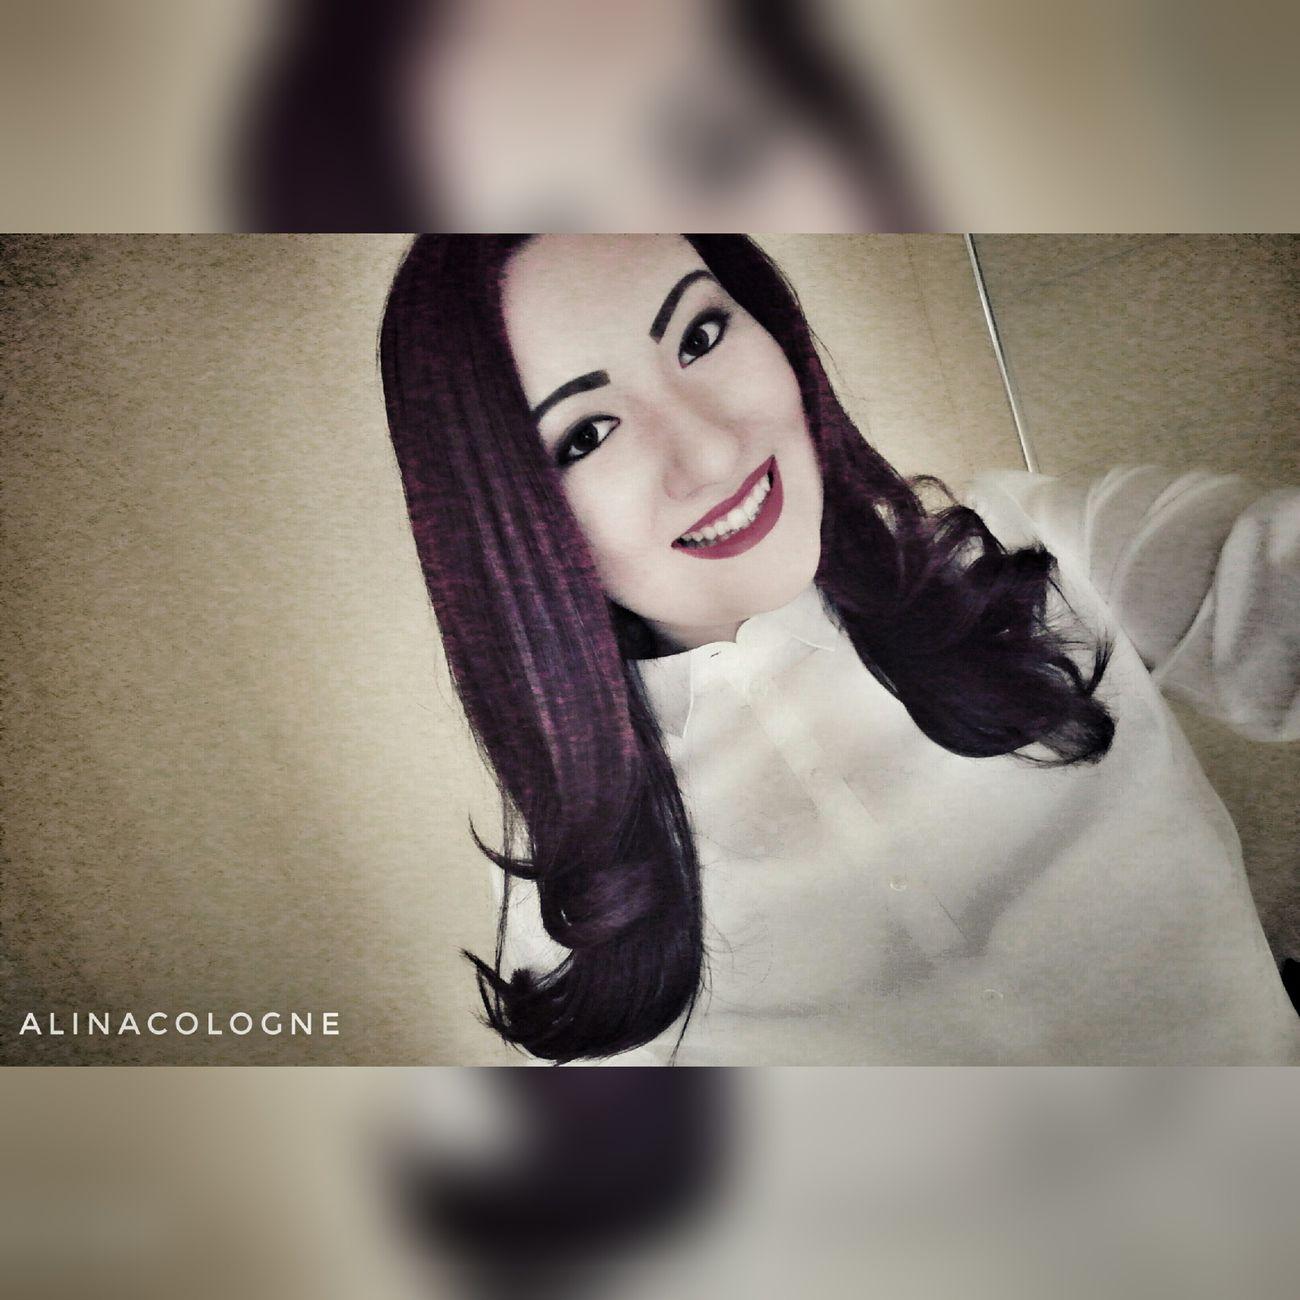 Instagram @alinacologne 👌😉📷🎢 Beauty Looking At Camera Fashion Women Rollercoasters Phantasialand Freizeitpark Lipstick Eyebrow Portrait Selfie ✌ Fotografie ınstagram